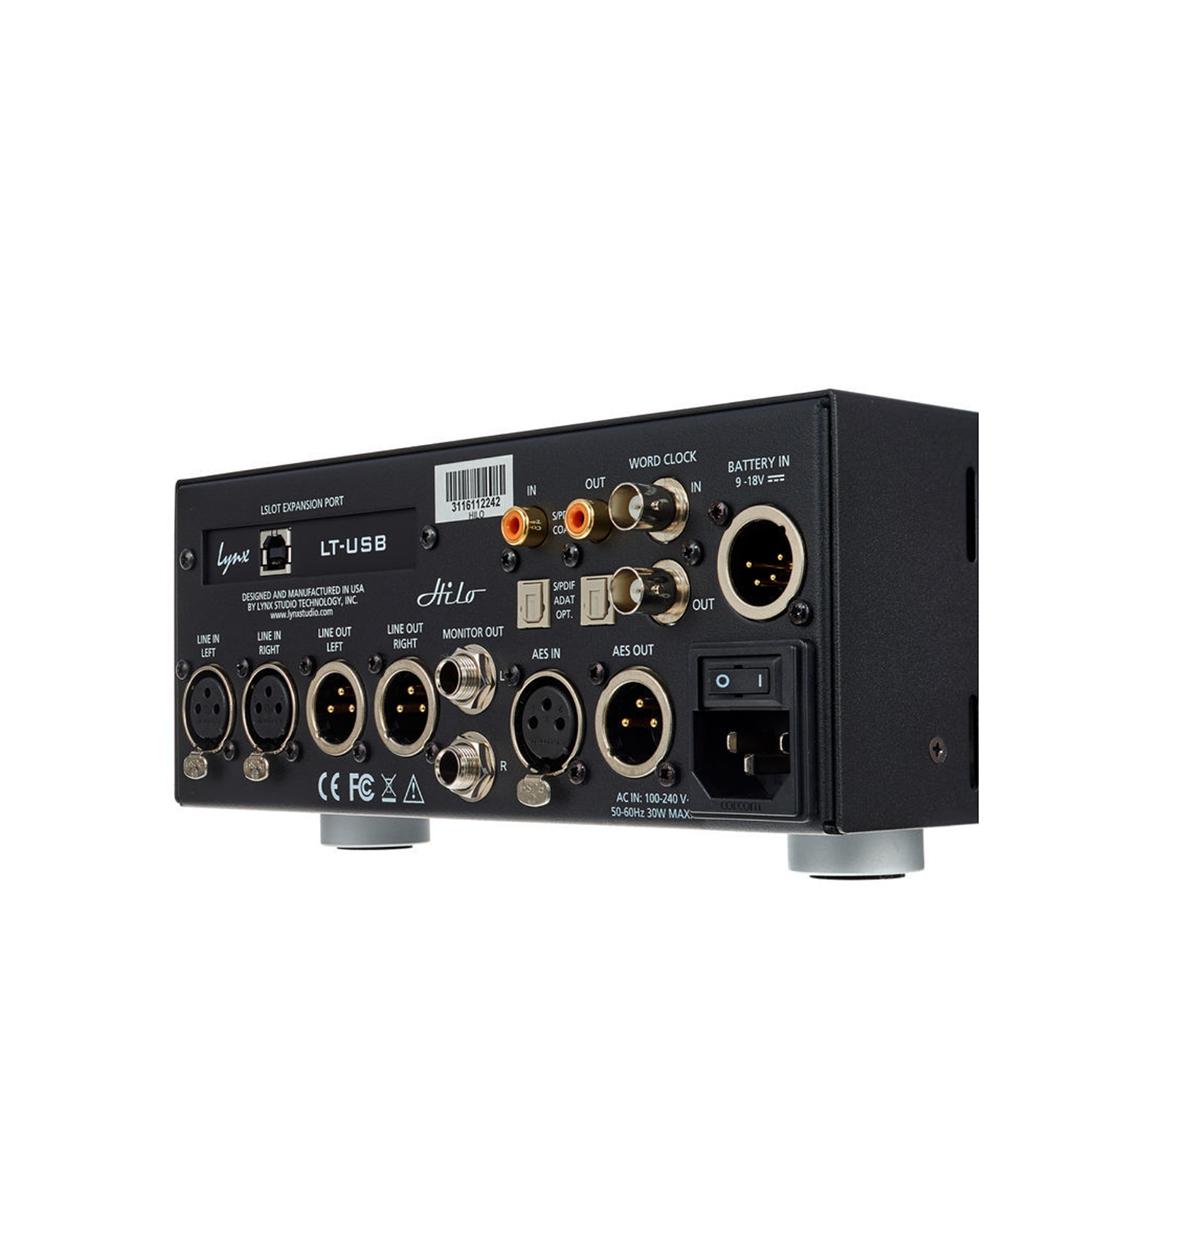 CONVERSOR AD/DA LYNX STUDIO TECHNOLOGY HILO REFERENCE USB BLACK